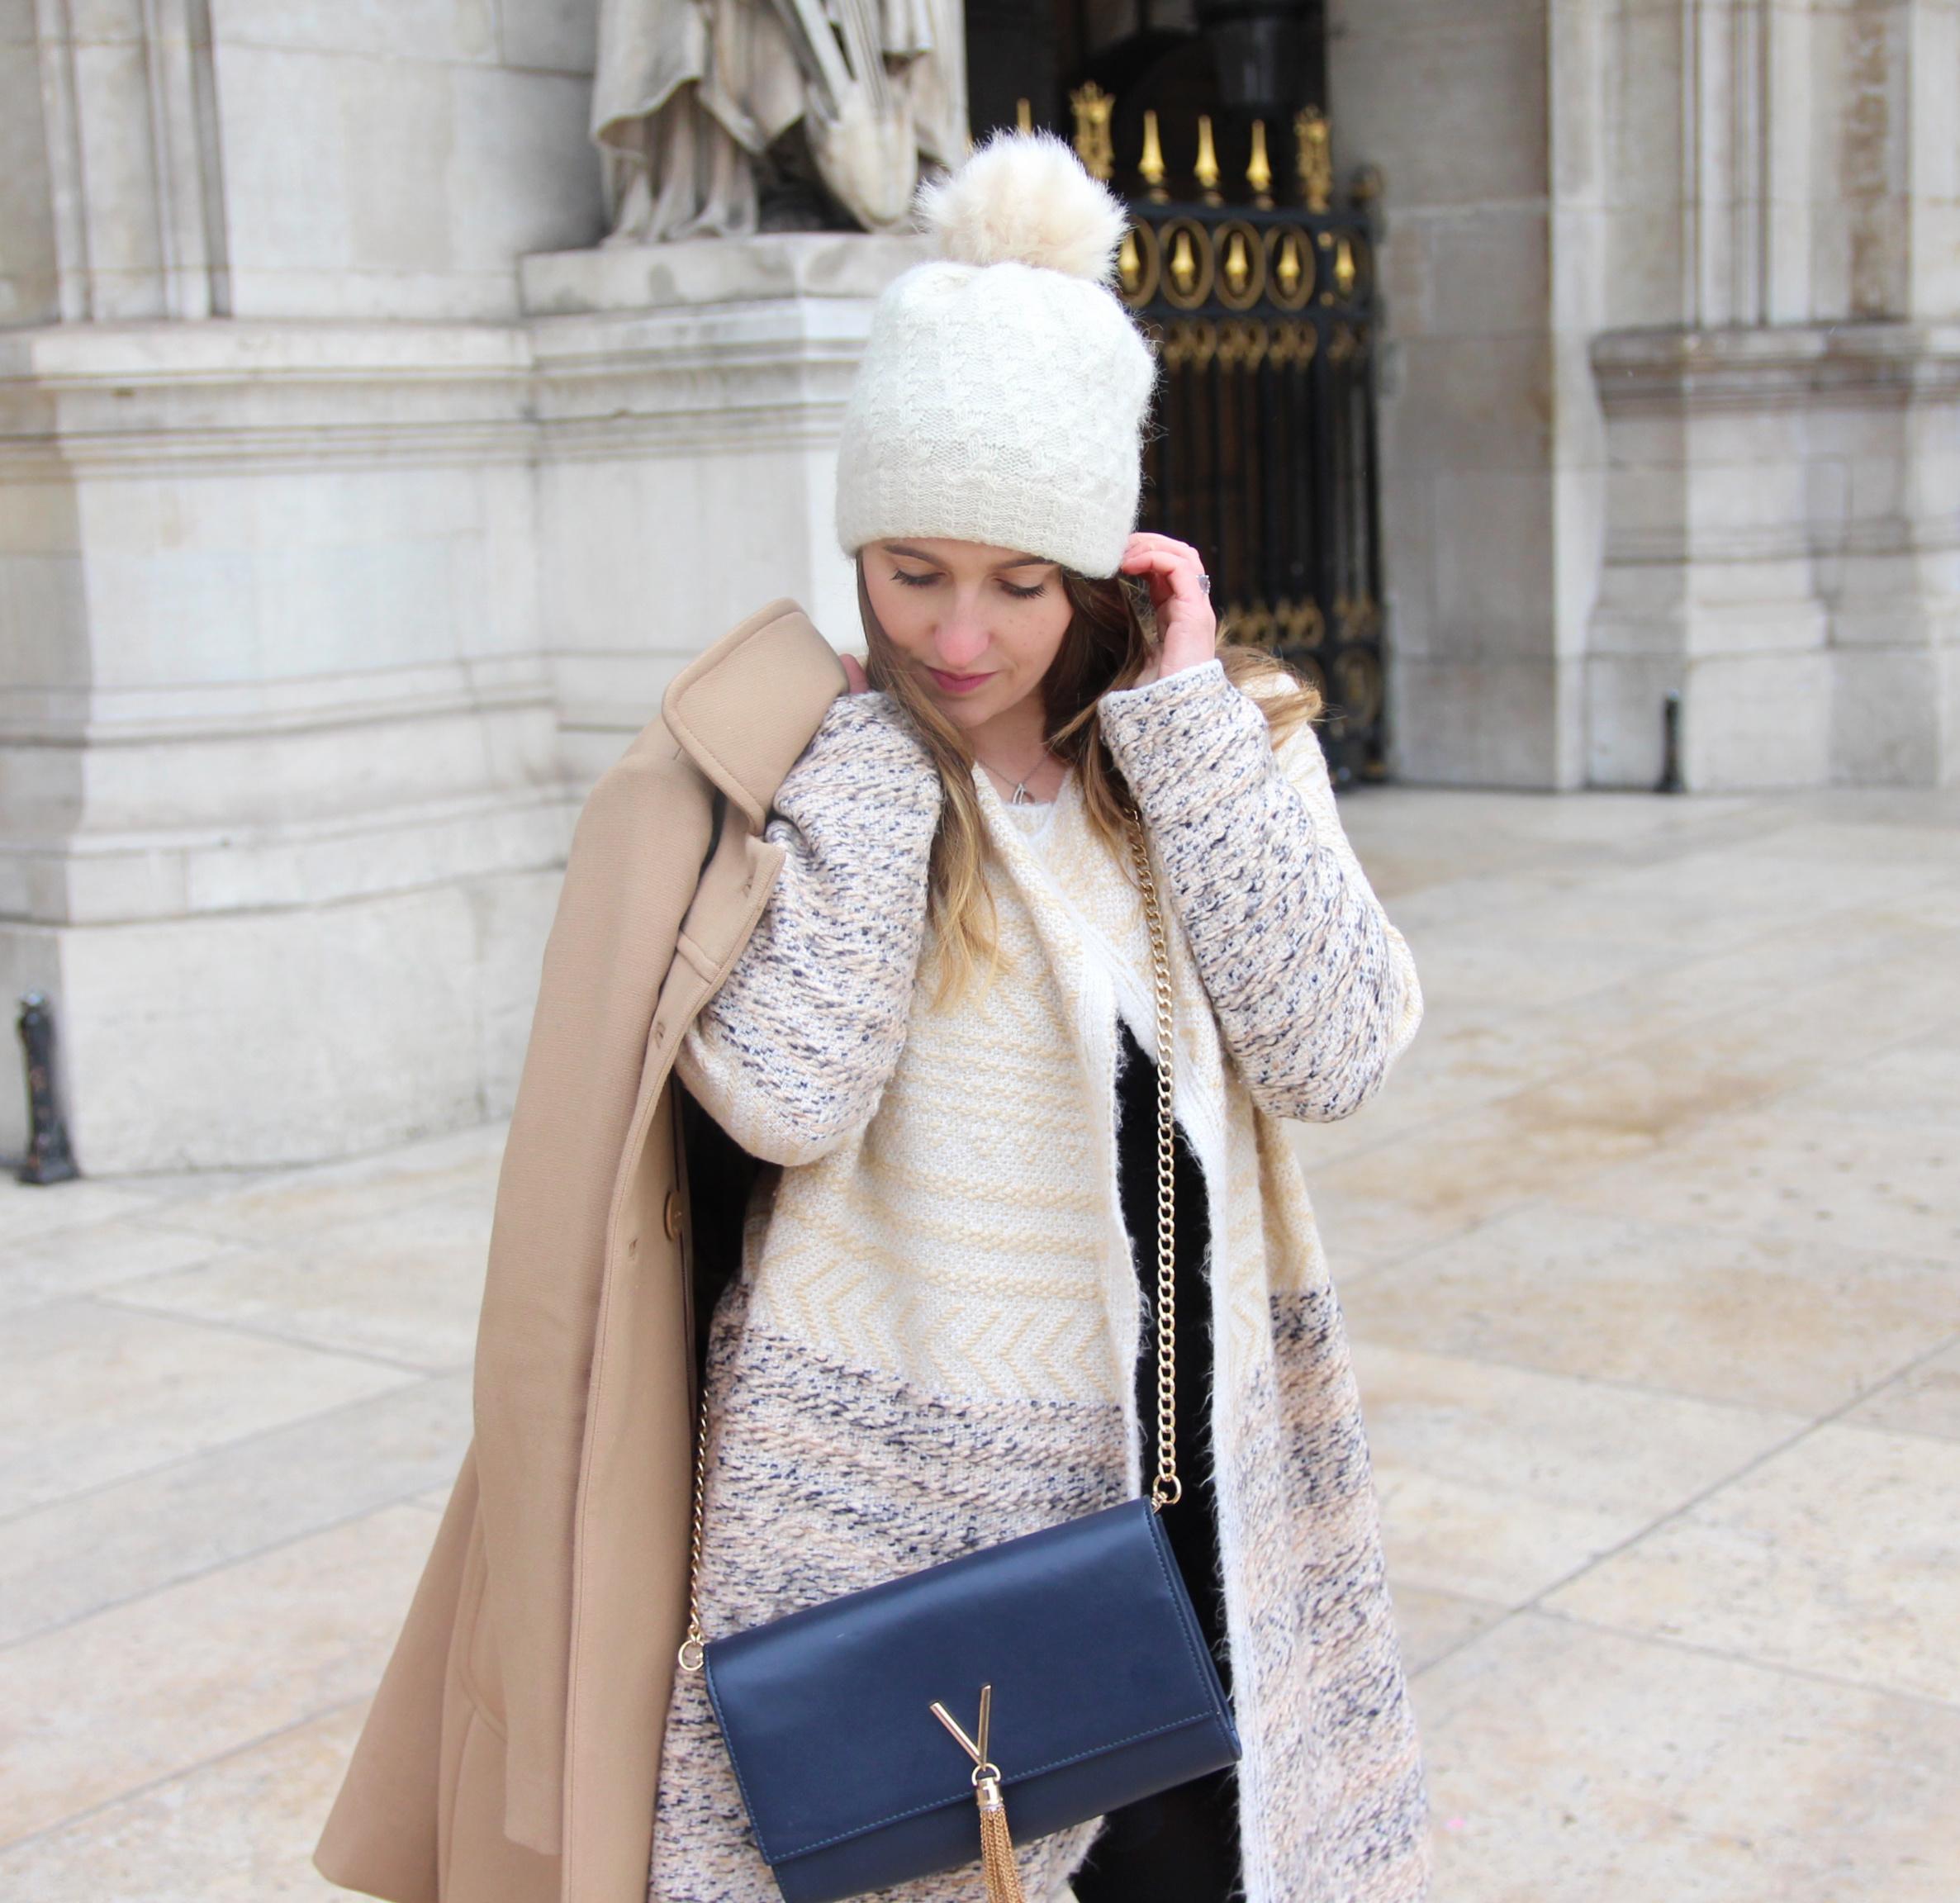 paris-opera-garnier-winter-day-influencer-style-personalstylist-imageconsultant-seralynepointcom-img_6722